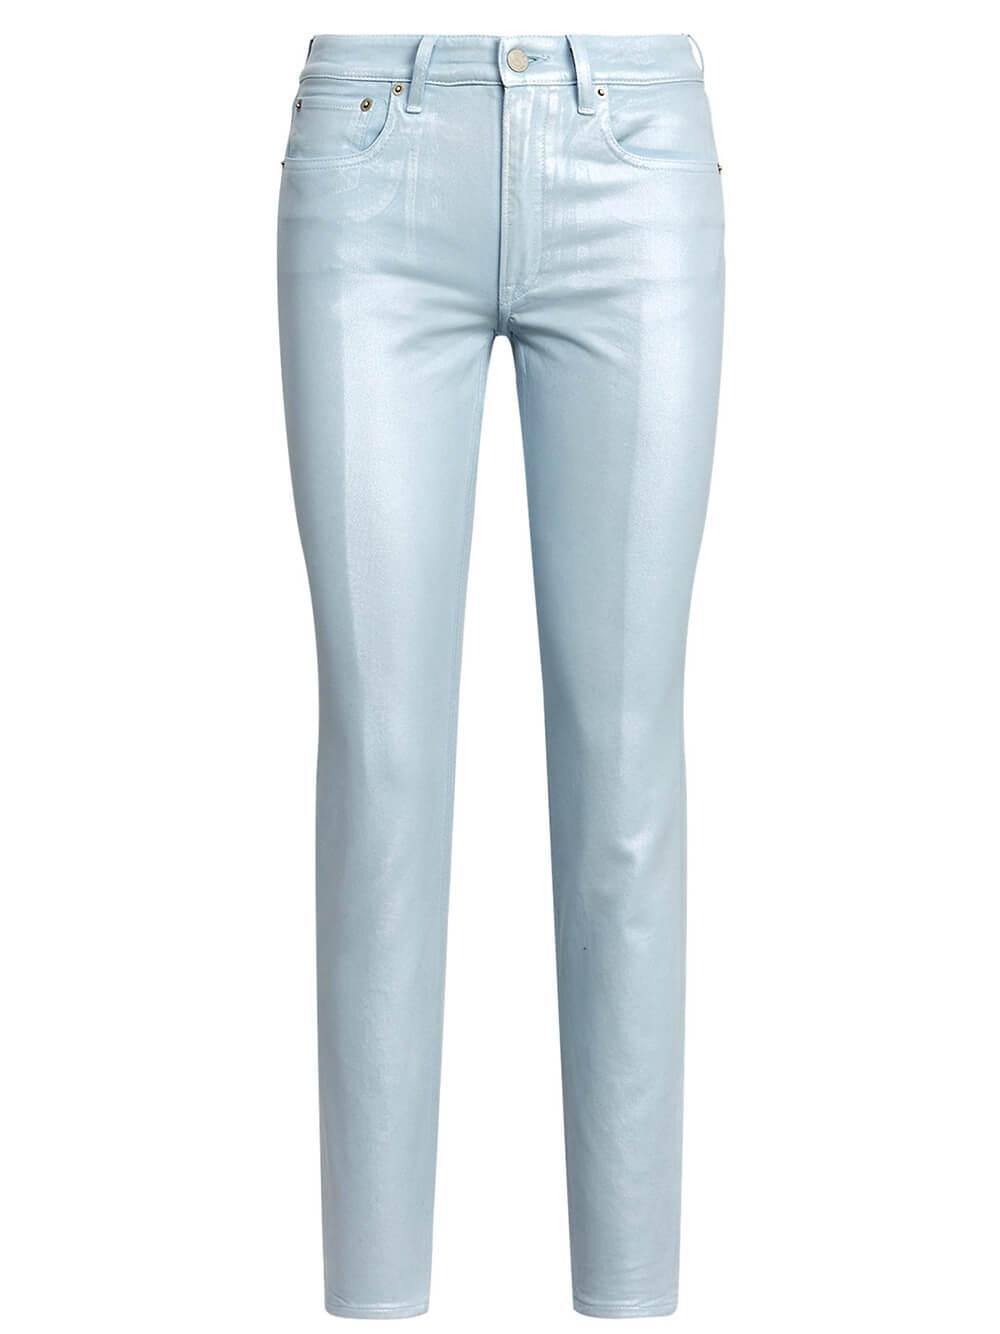 400 Matchstick Foiled Jean